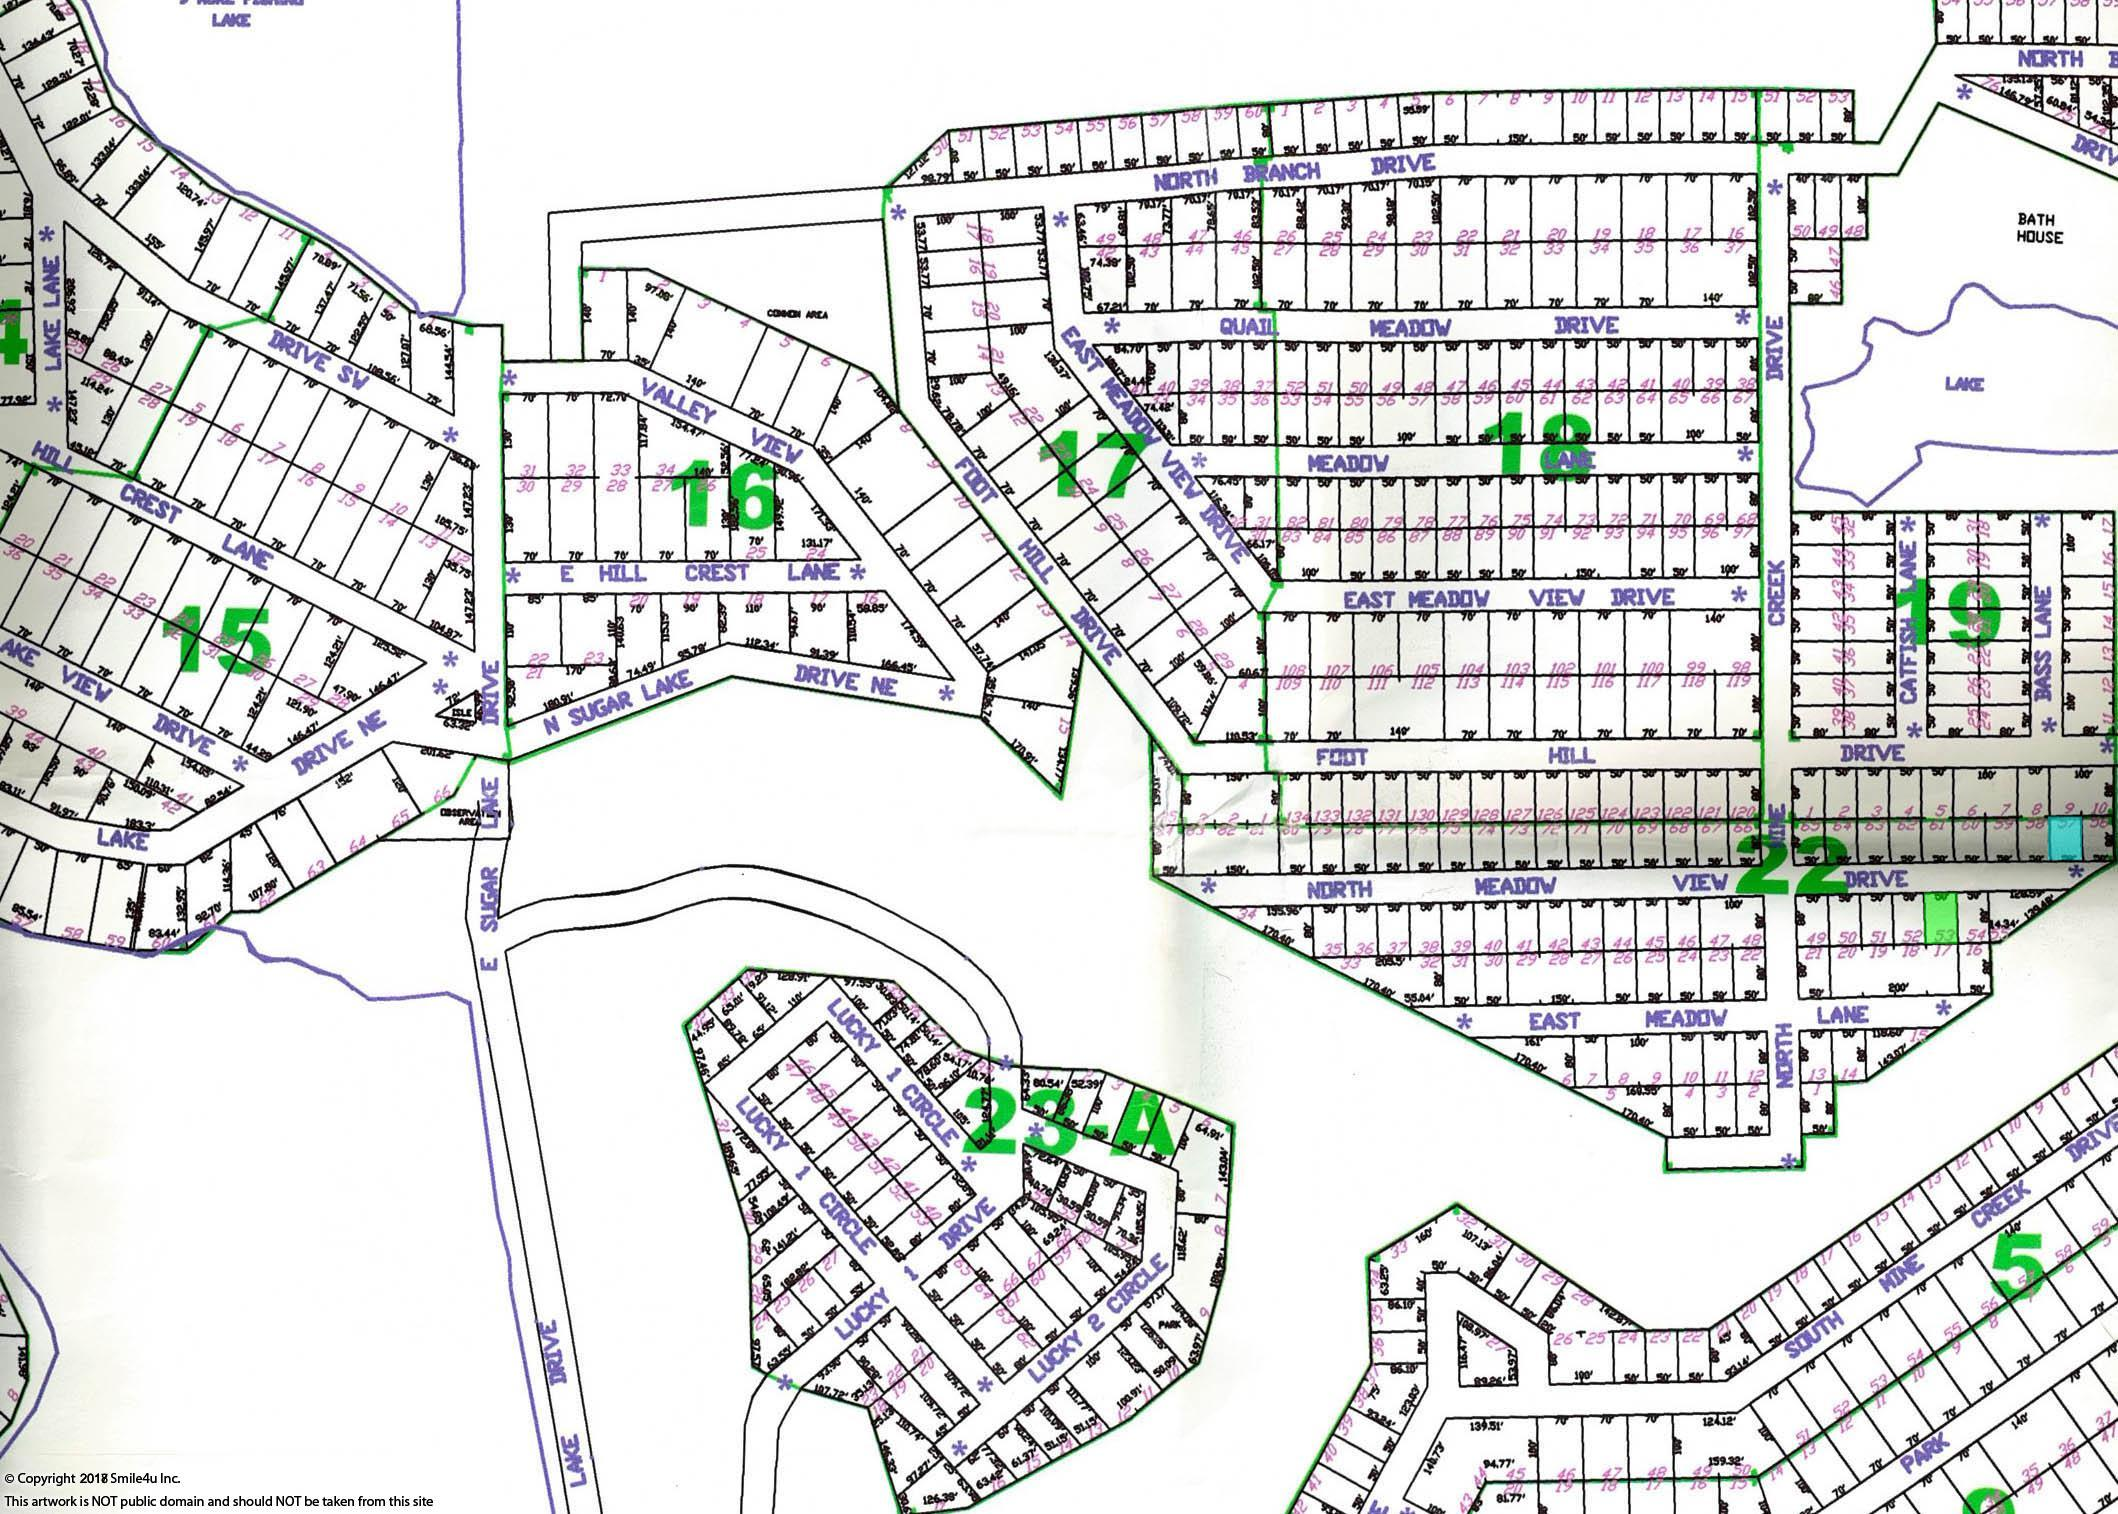 410385_watermarked_map.jpg